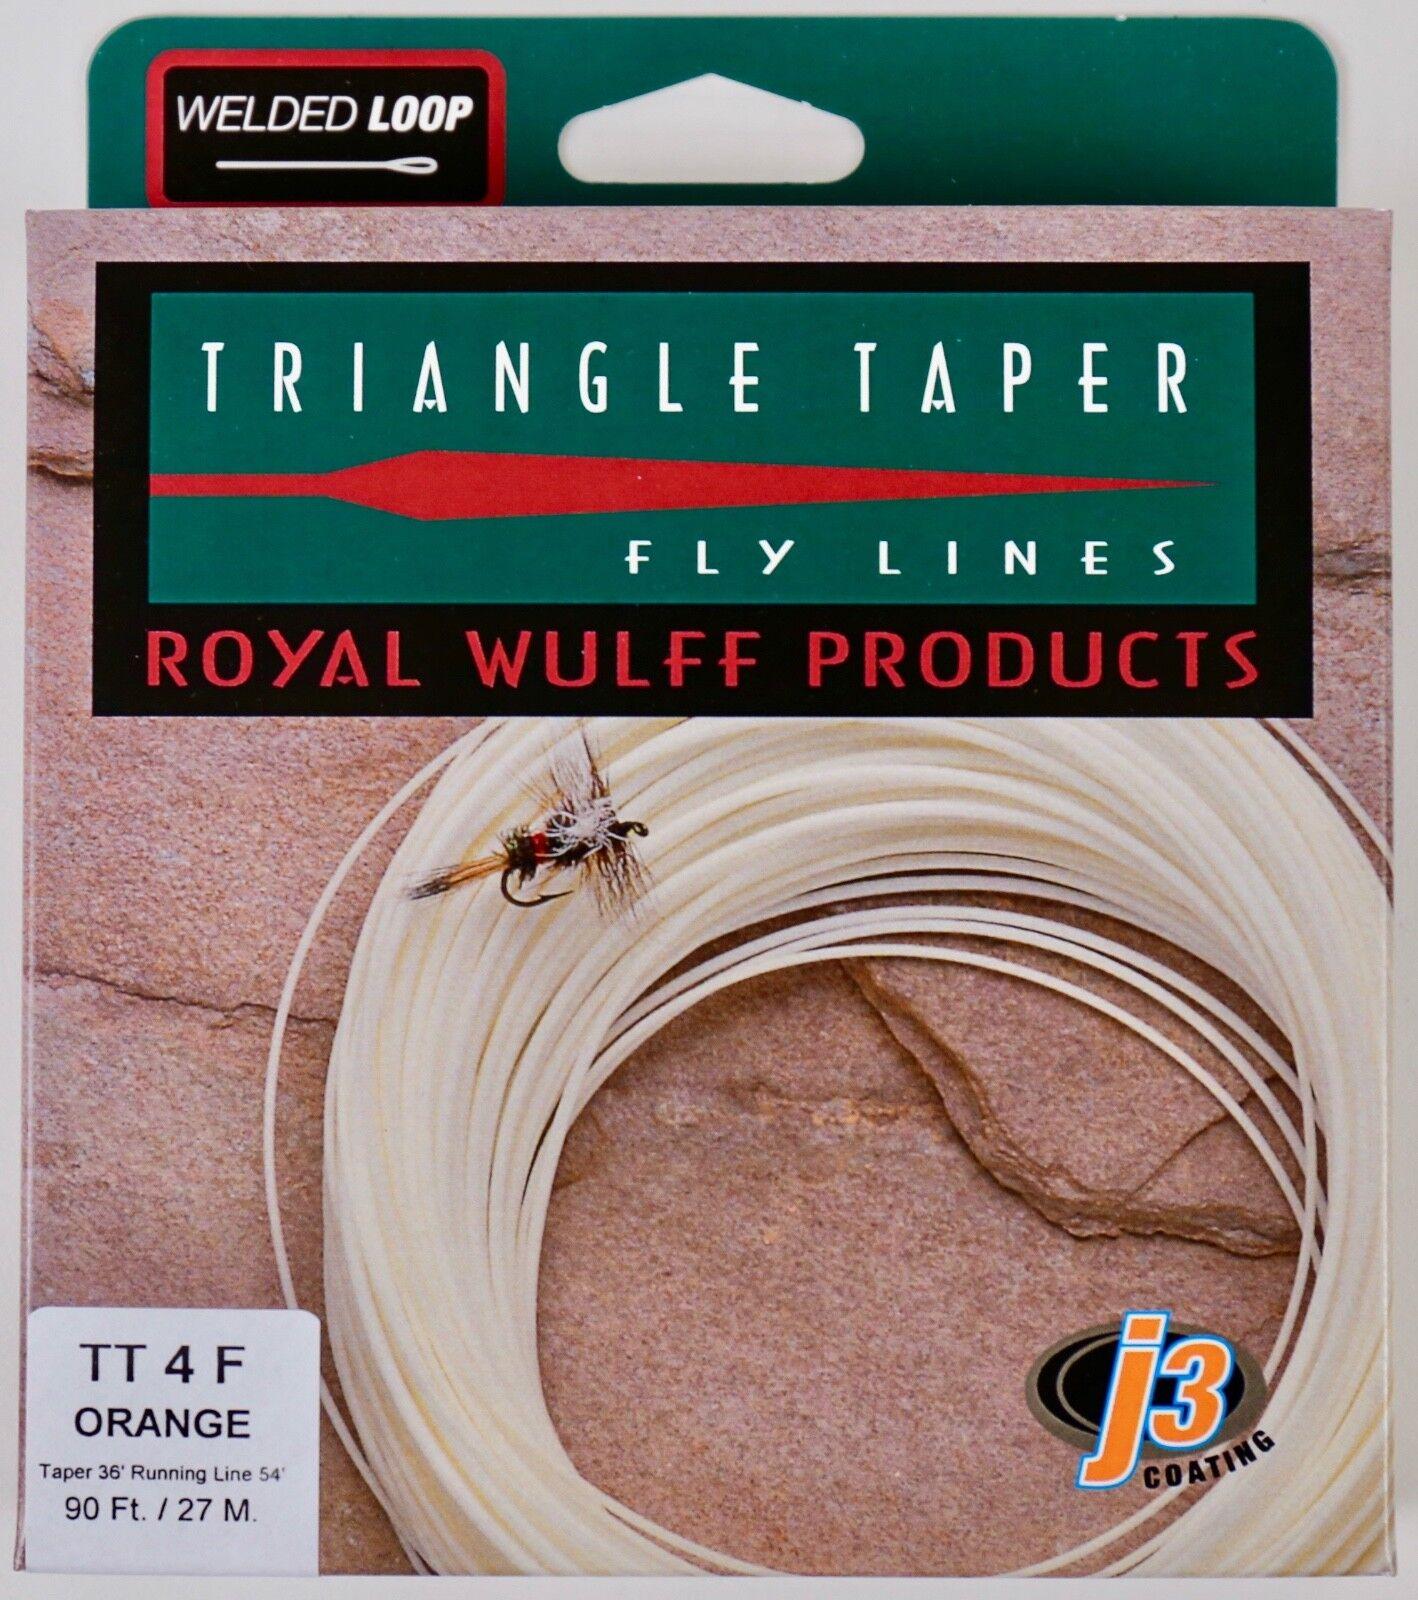 Royal Wulff Triangle Taper 4 WT Floating Fly Line arancia gratuito Fast Ship TT4FO